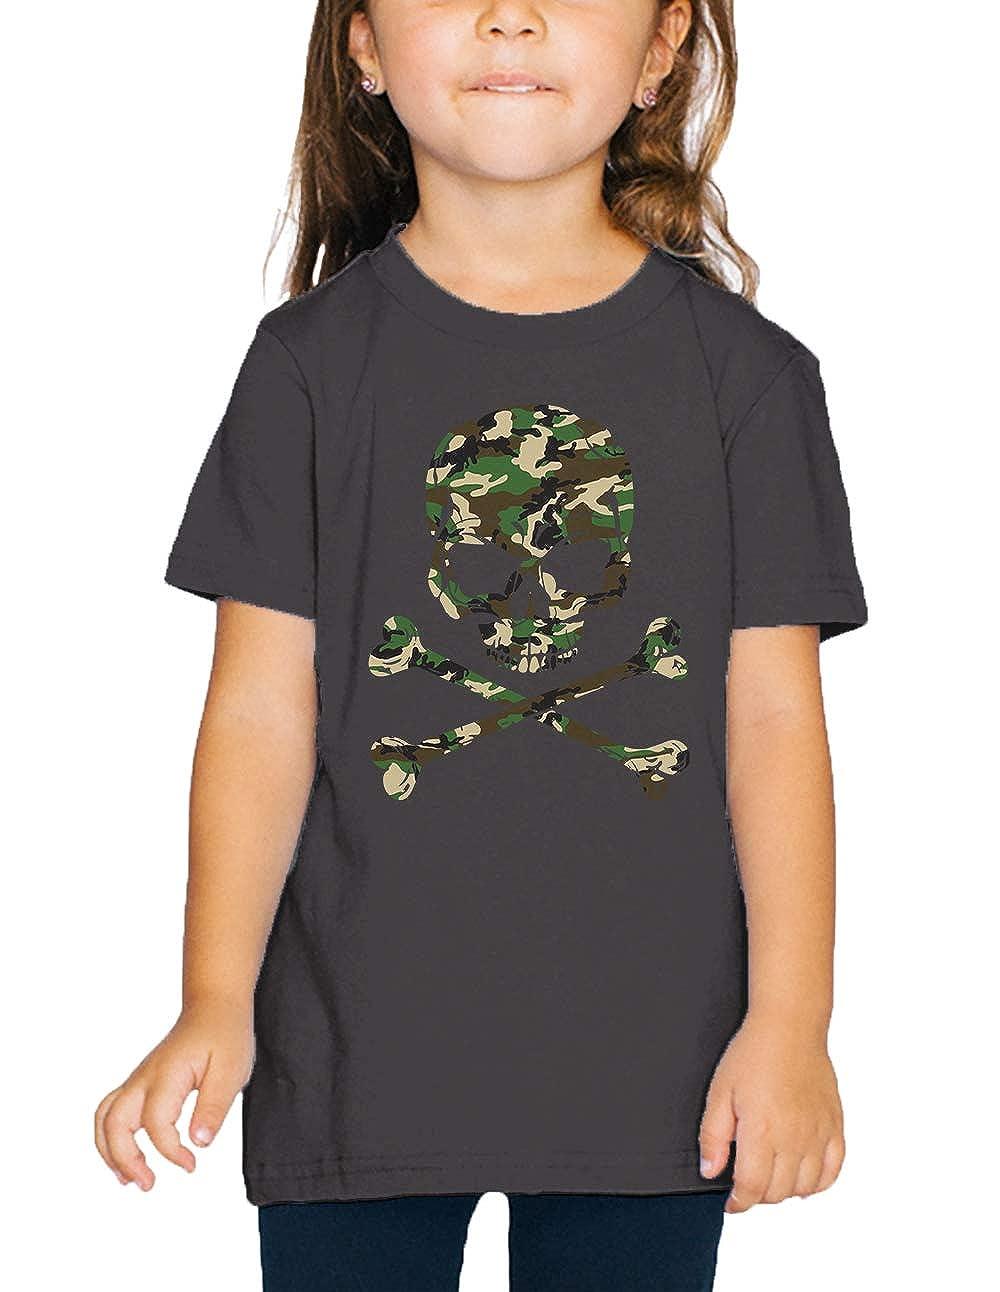 SpiritForged Apparel Camo Skull and Crossbones Toddler T-Shirt